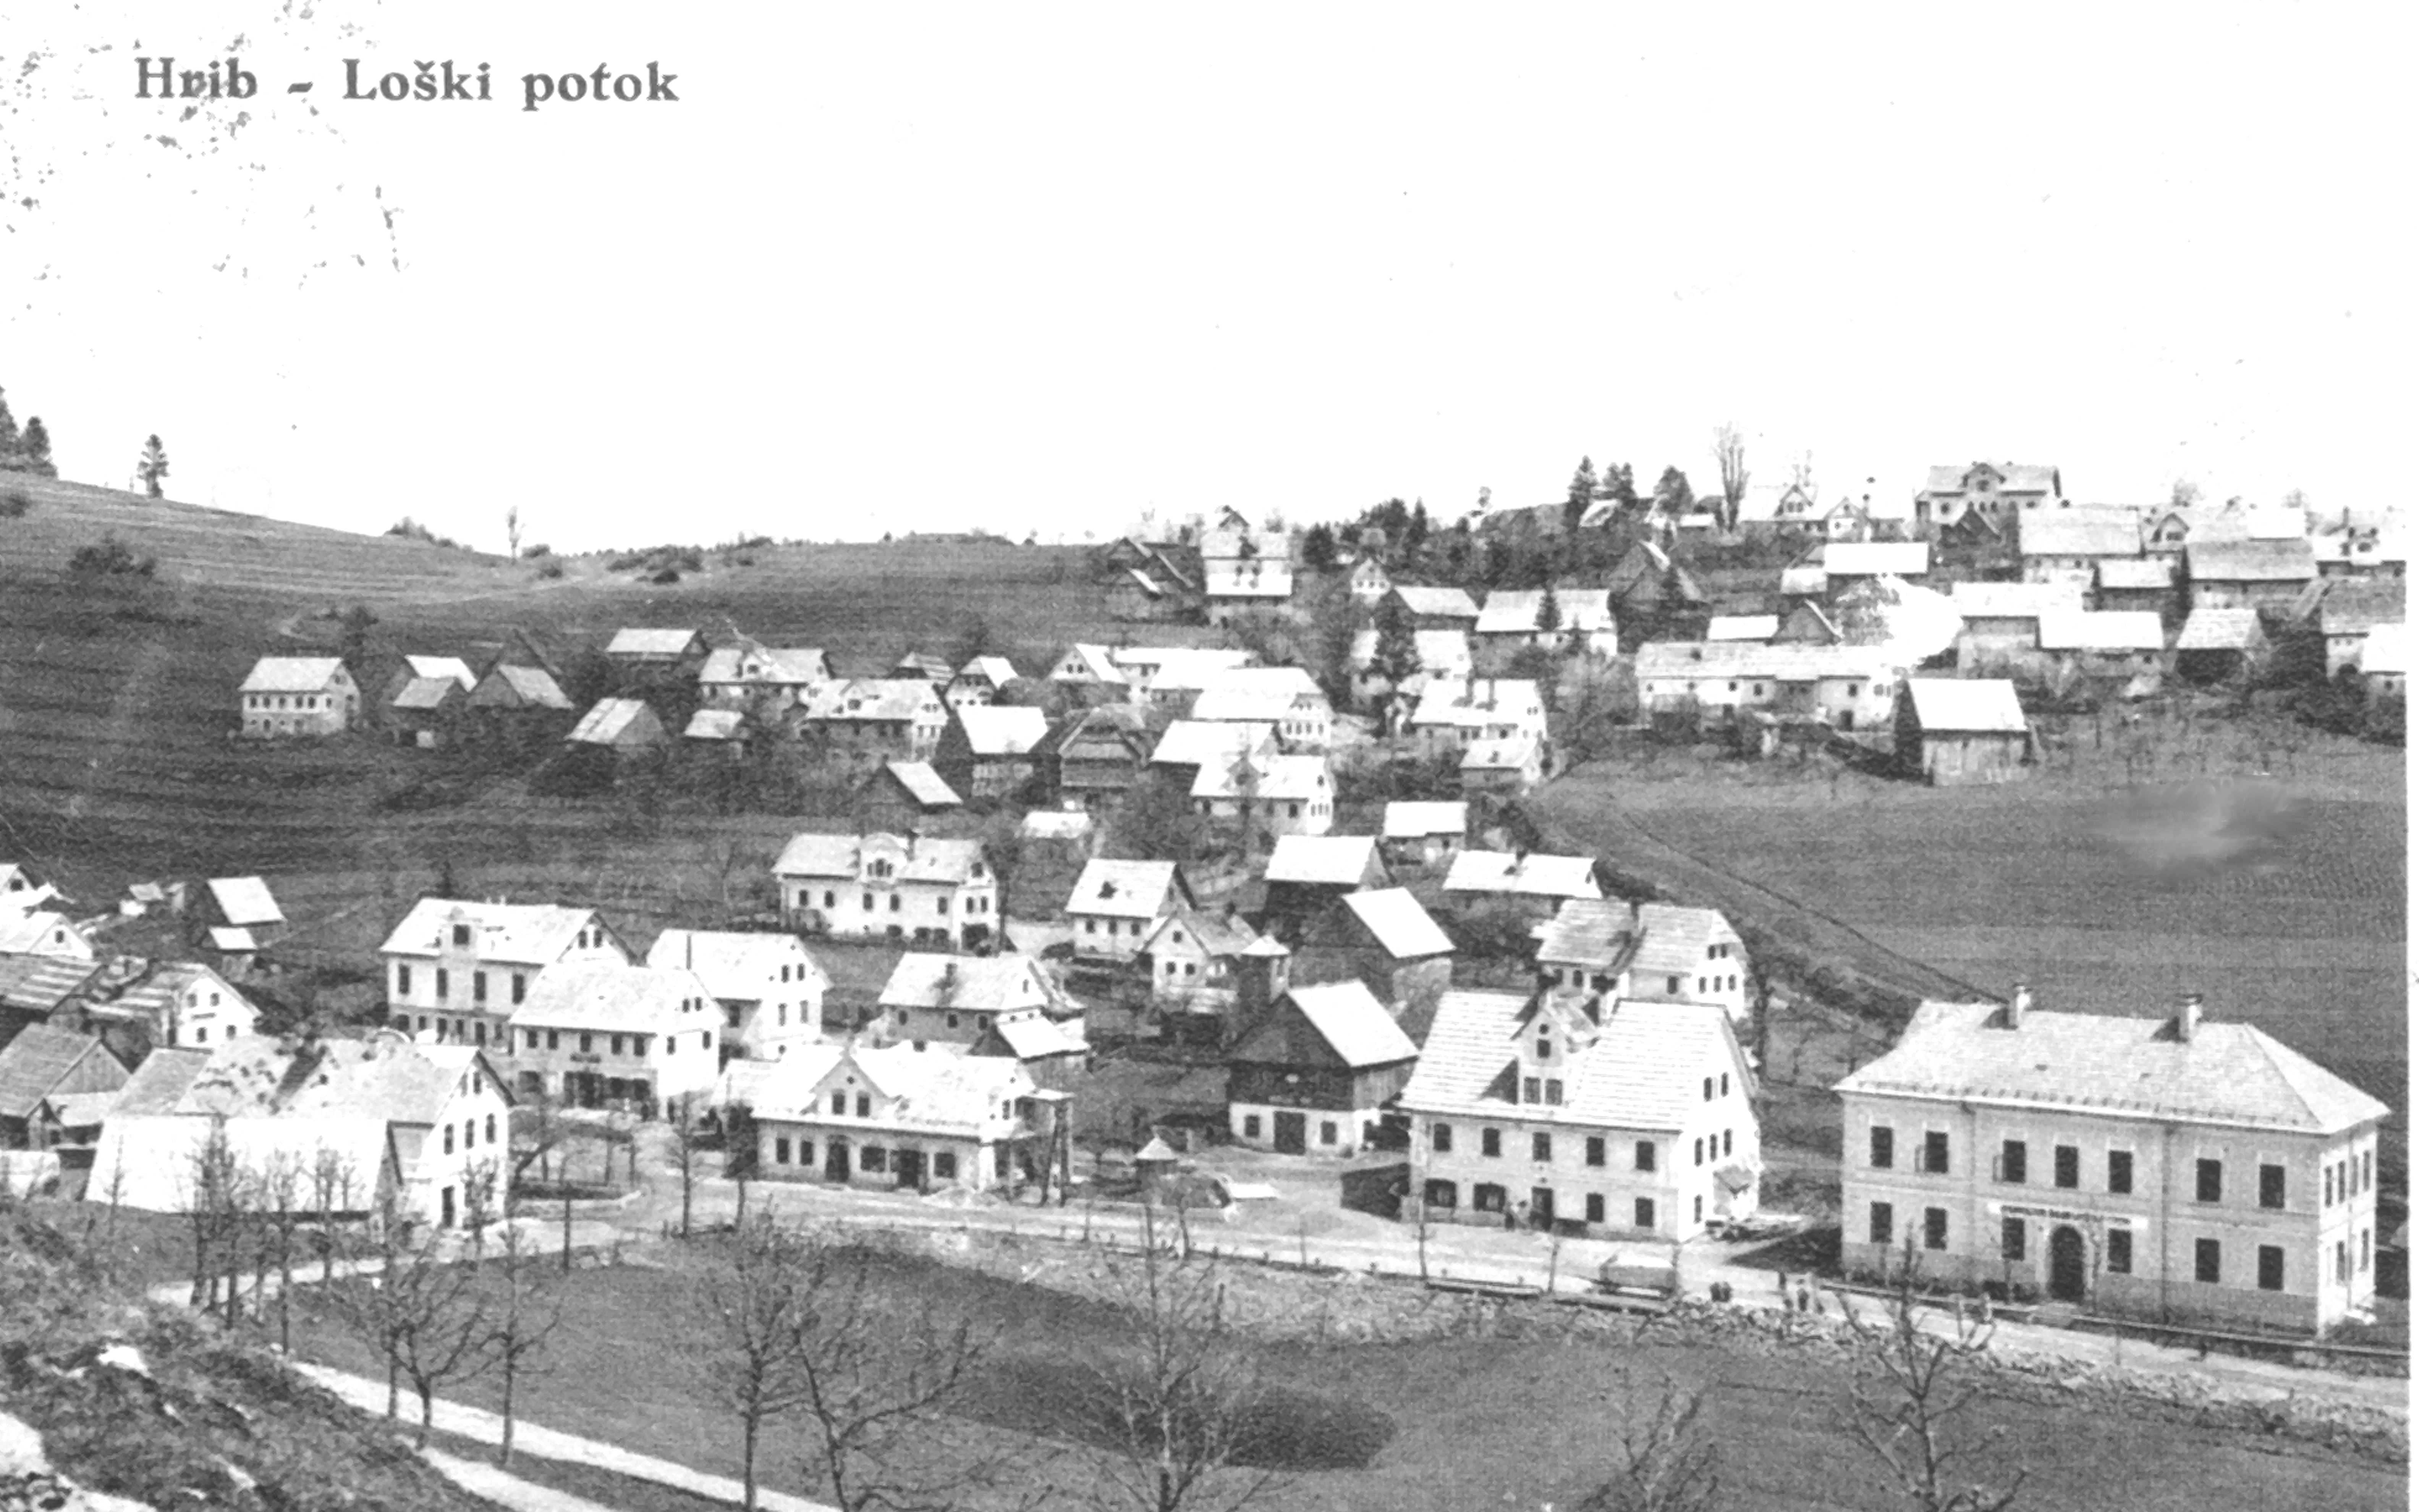 hrib1-okrog-1930